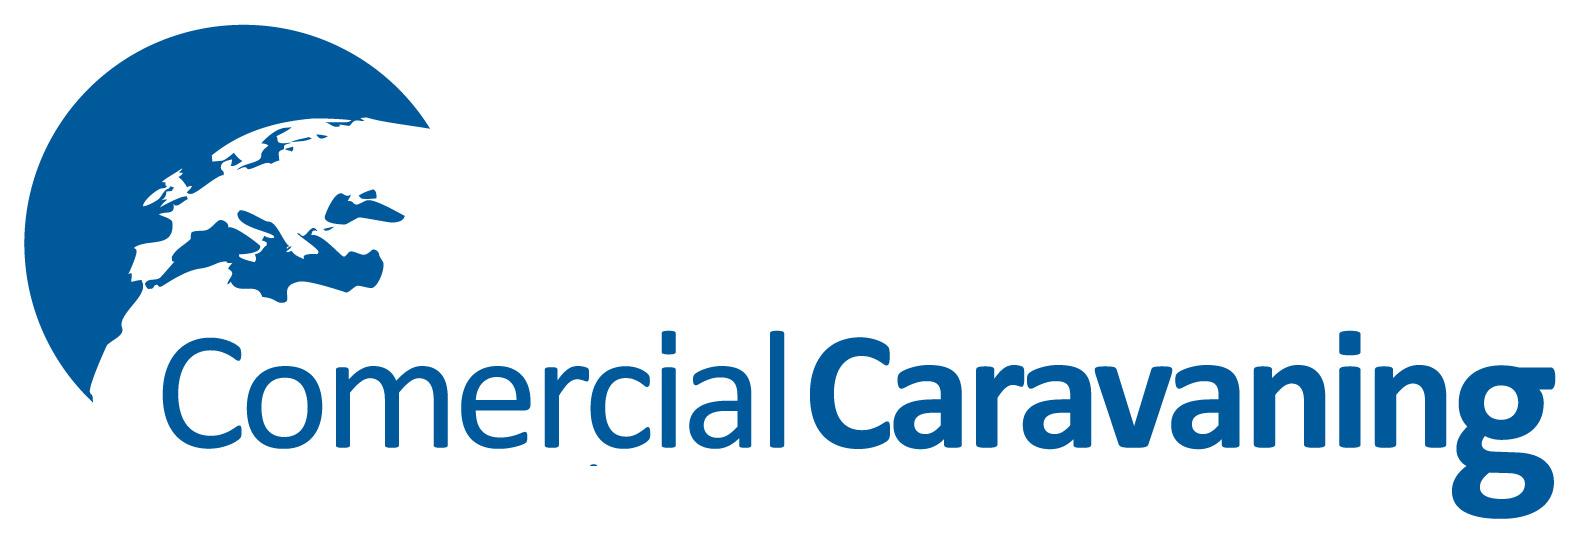 COMERCIAL CARAVANING - www.micaravana.com